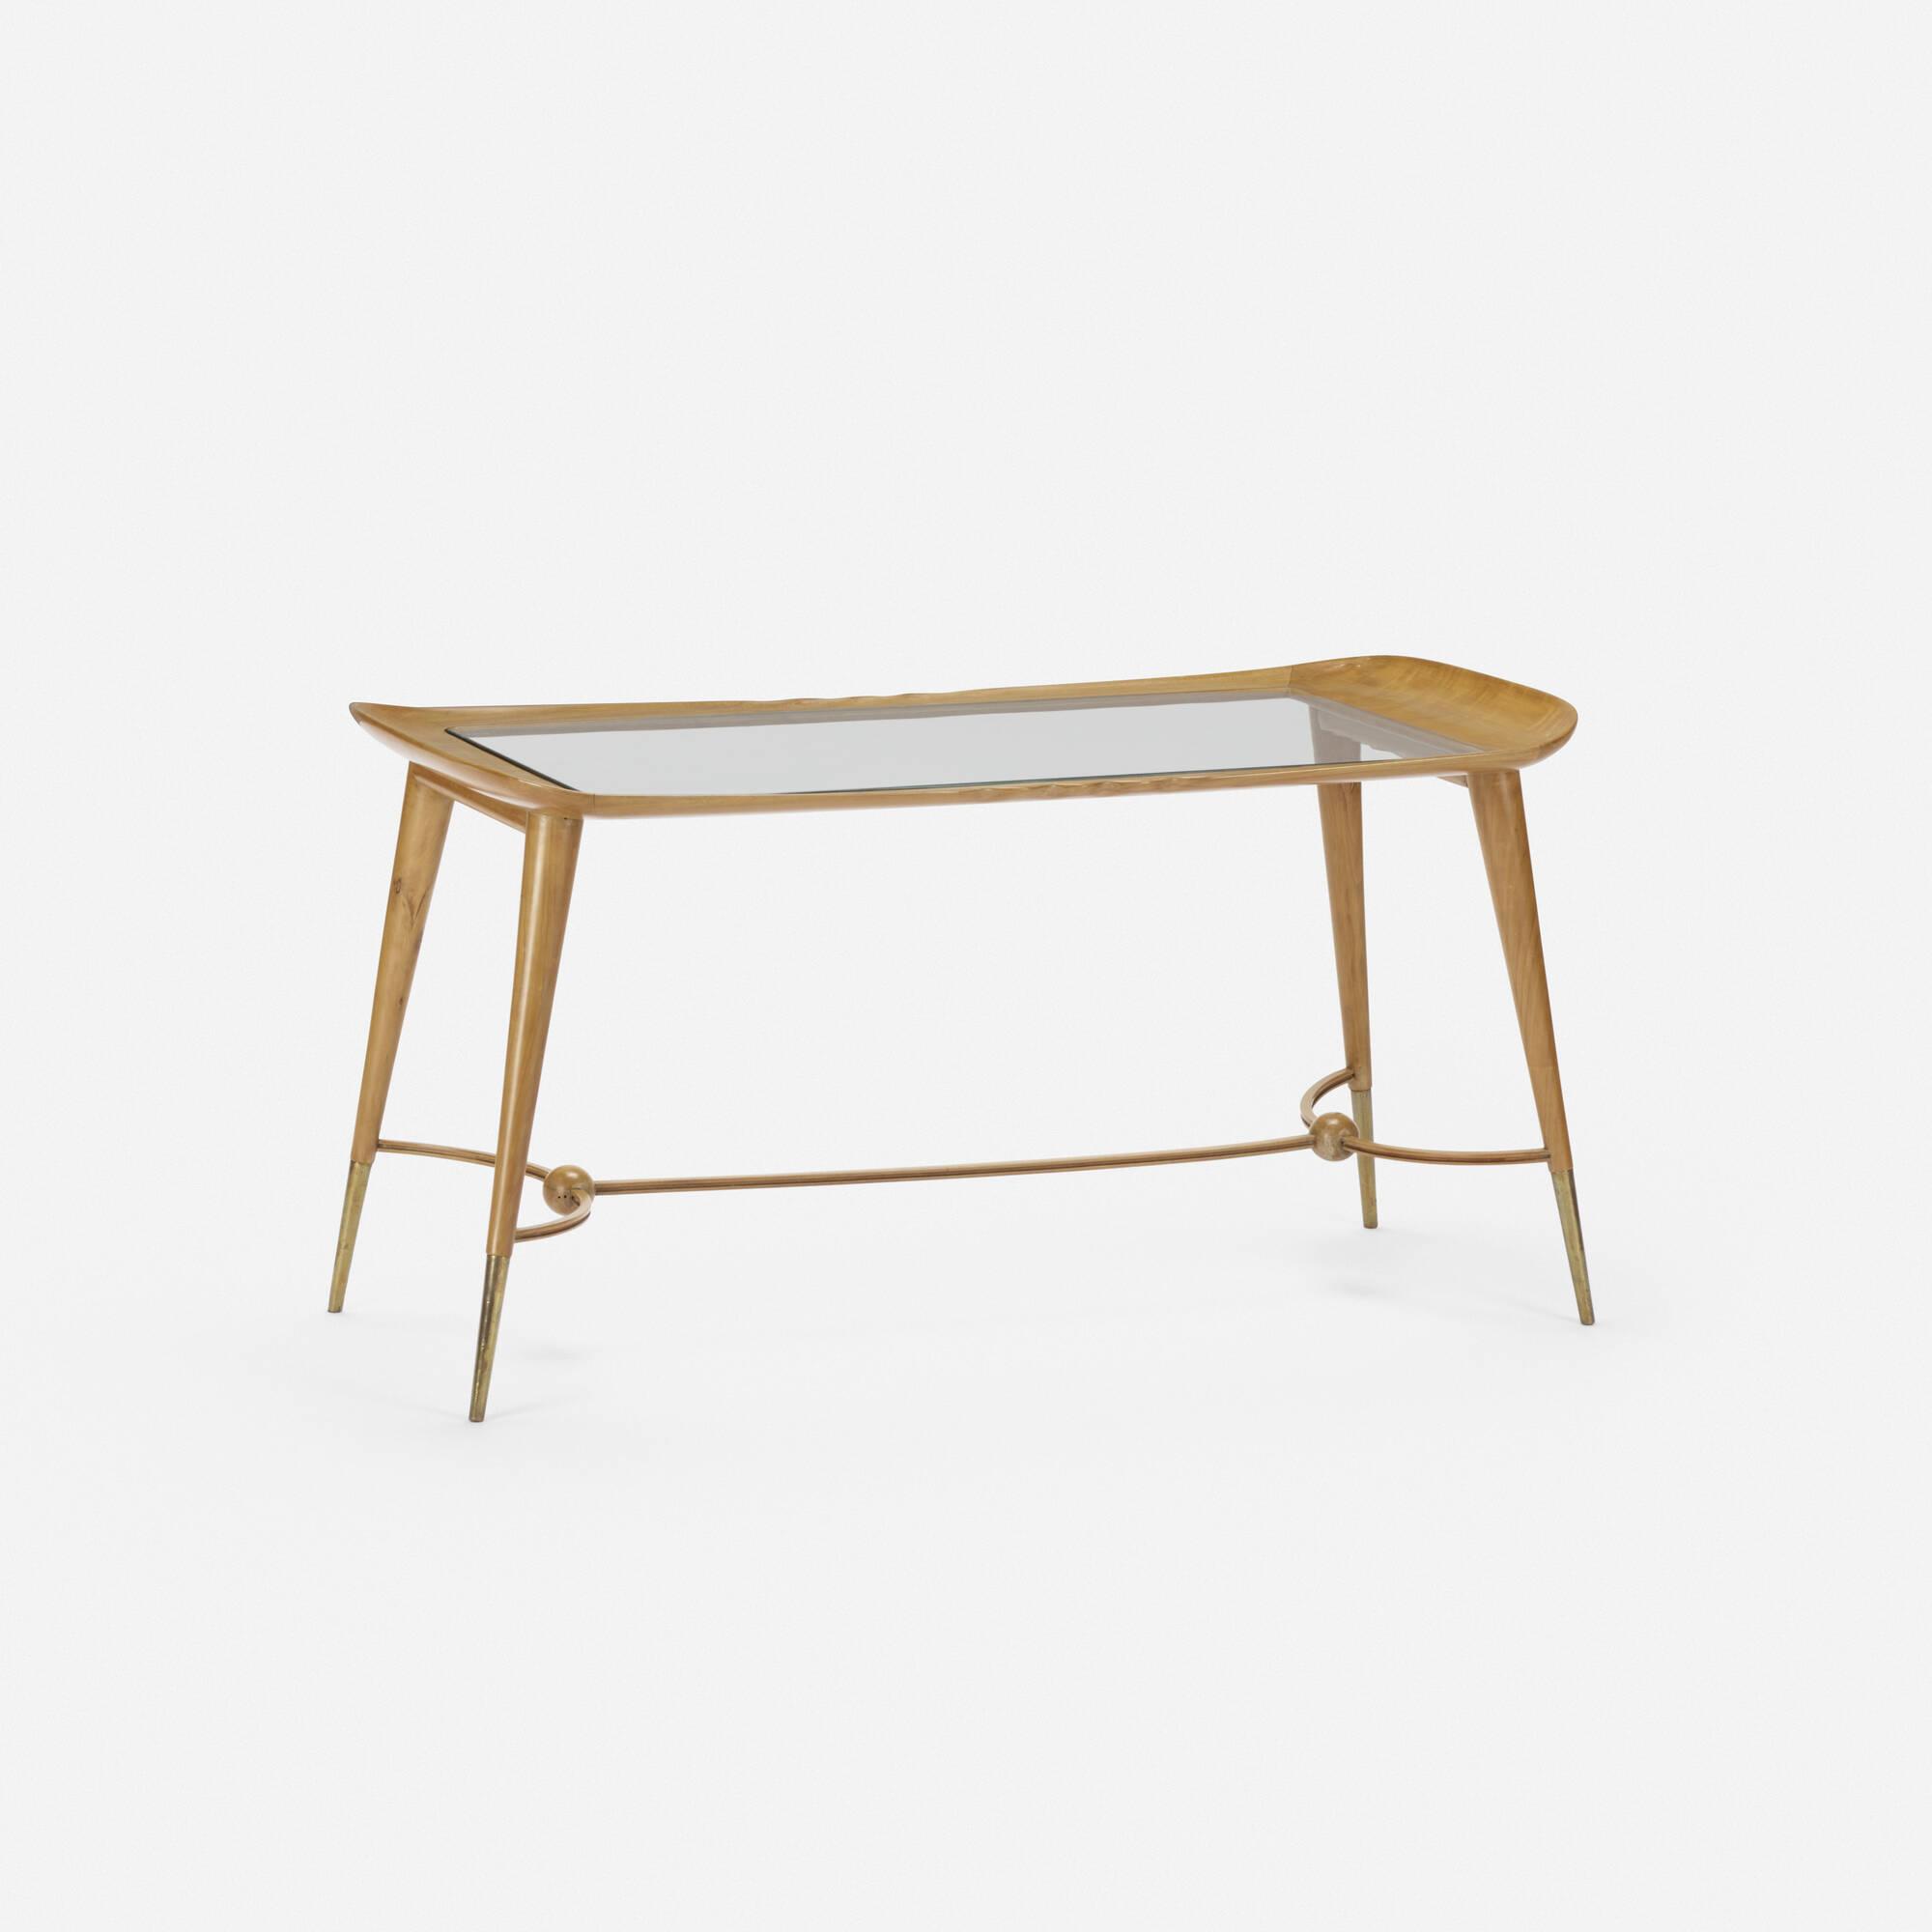 261: Paolo Buffa, attribution / coffee table (1 of 3)